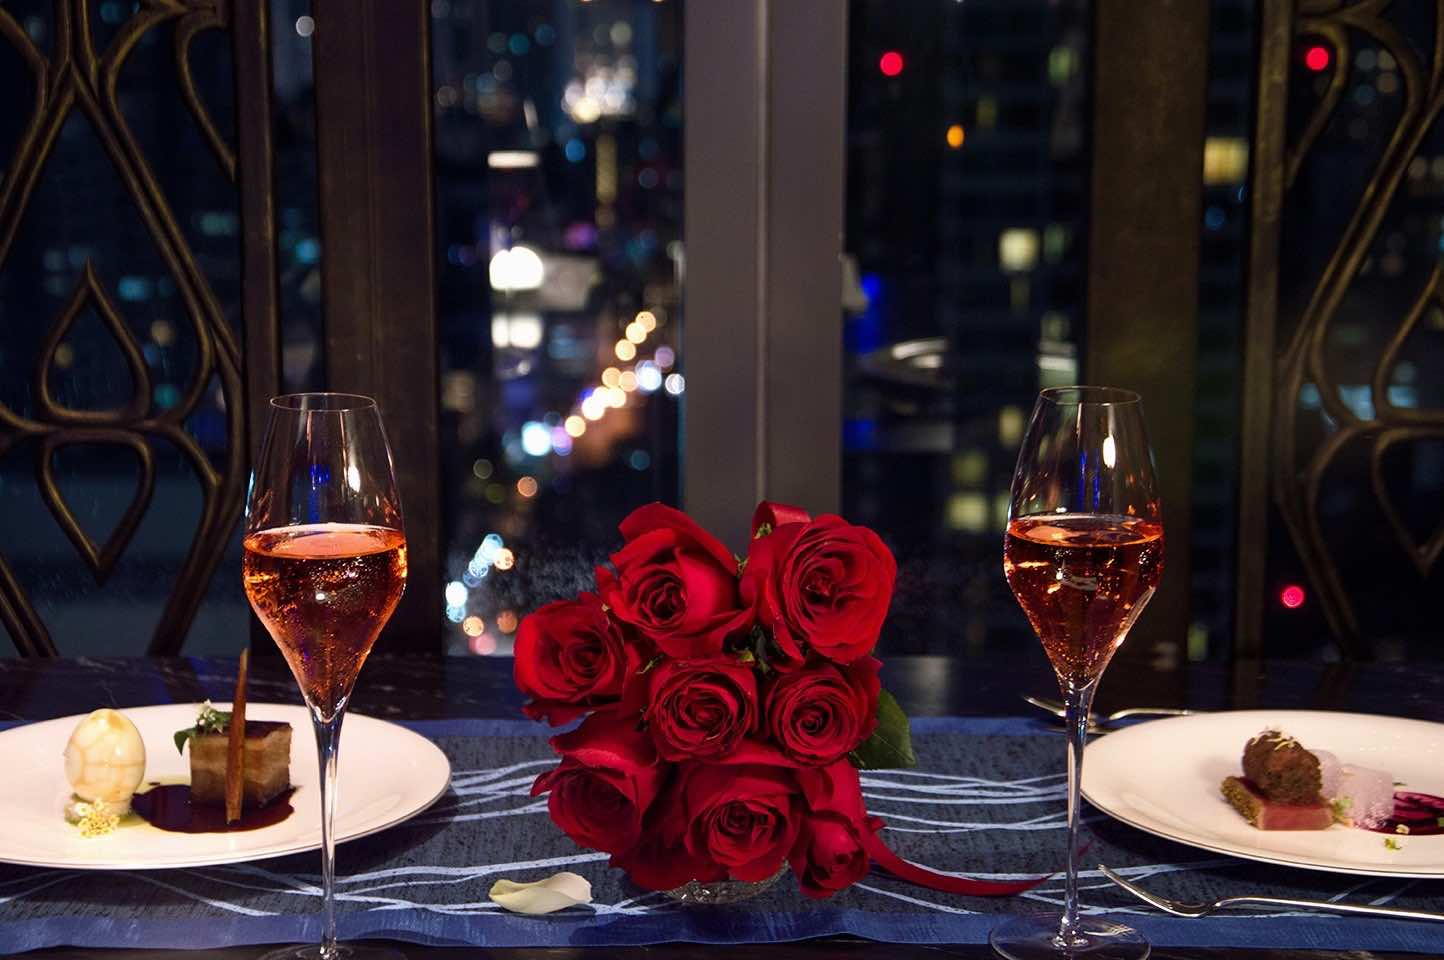 Valentine's Dinner Promotion at Nimitr